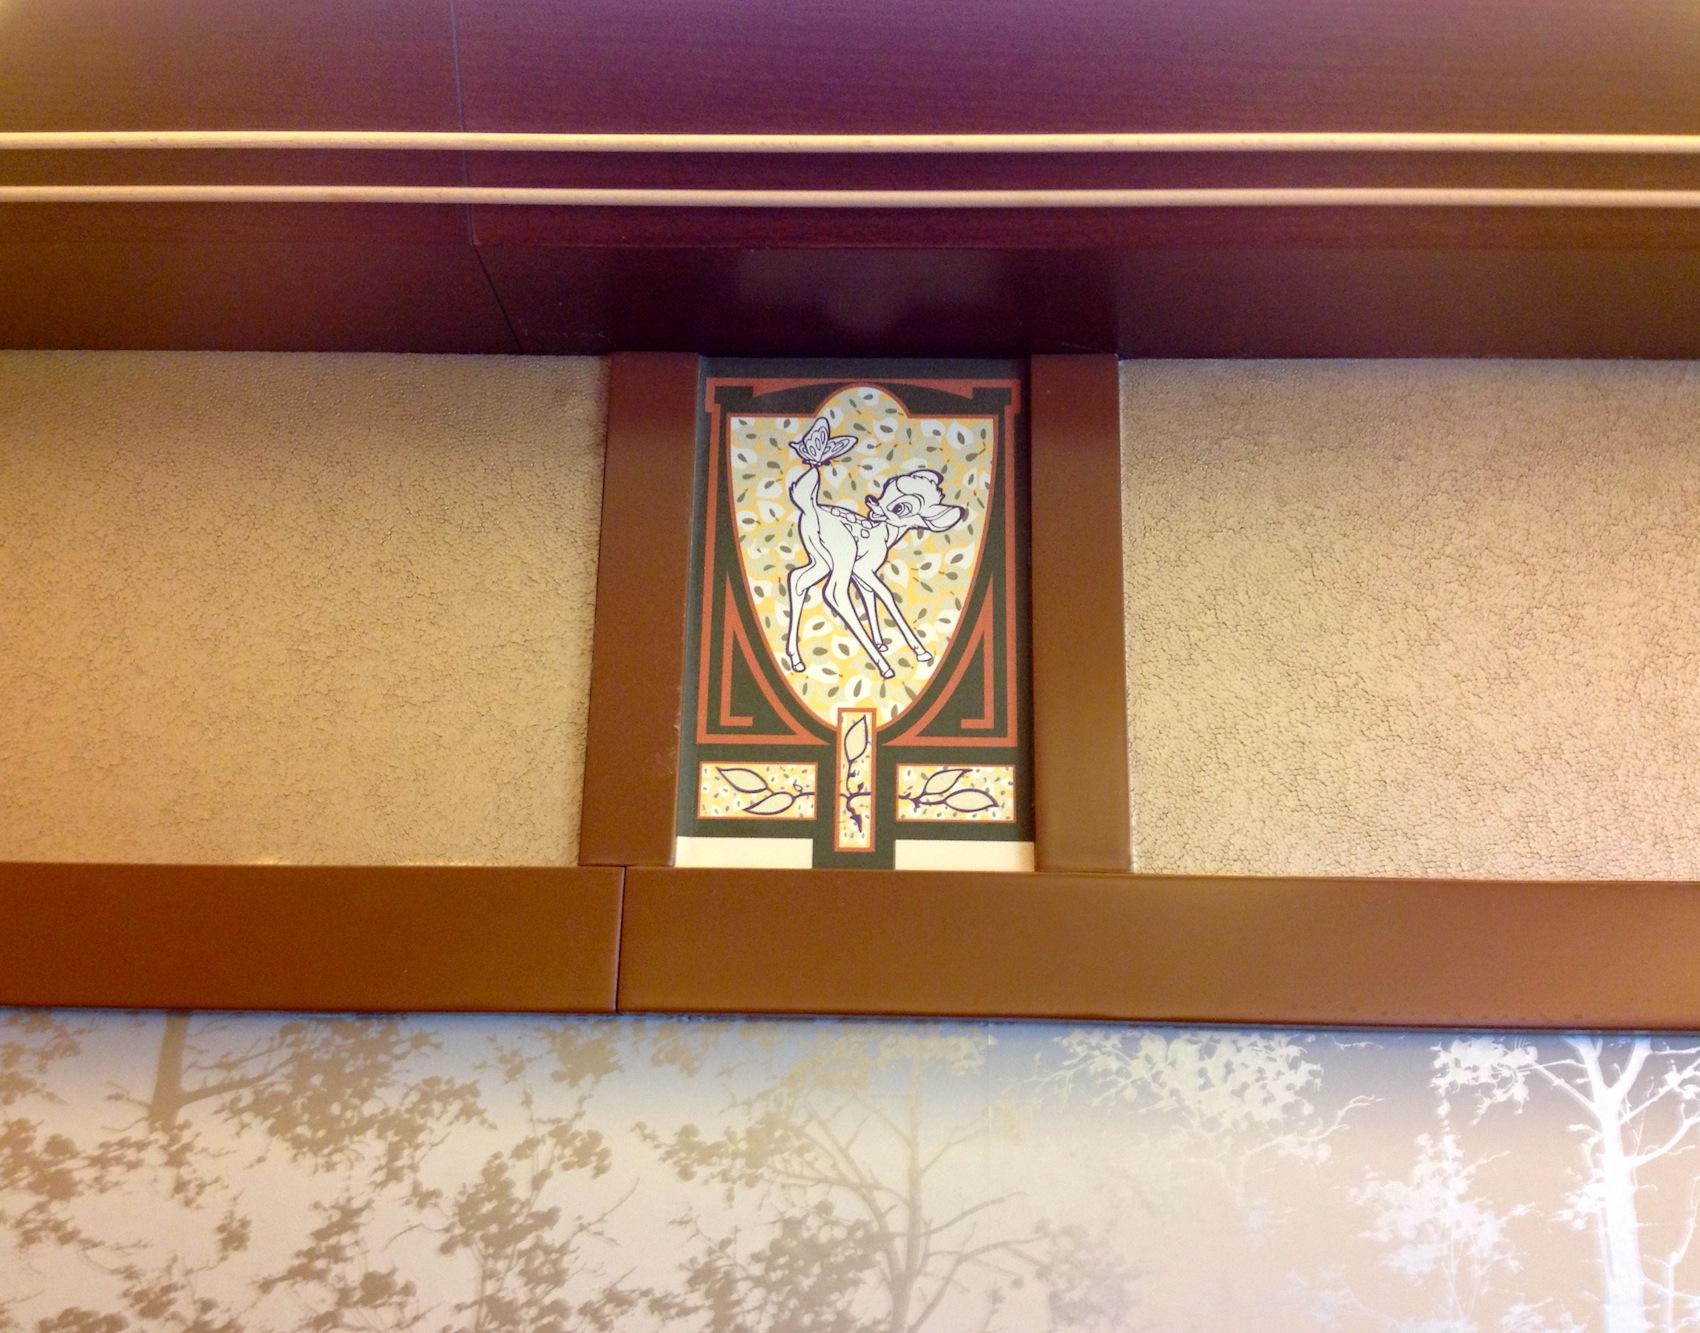 Bambi chambre sequoia lodge hotel disneyland paris room - Chambre standard sequoia lodge ...